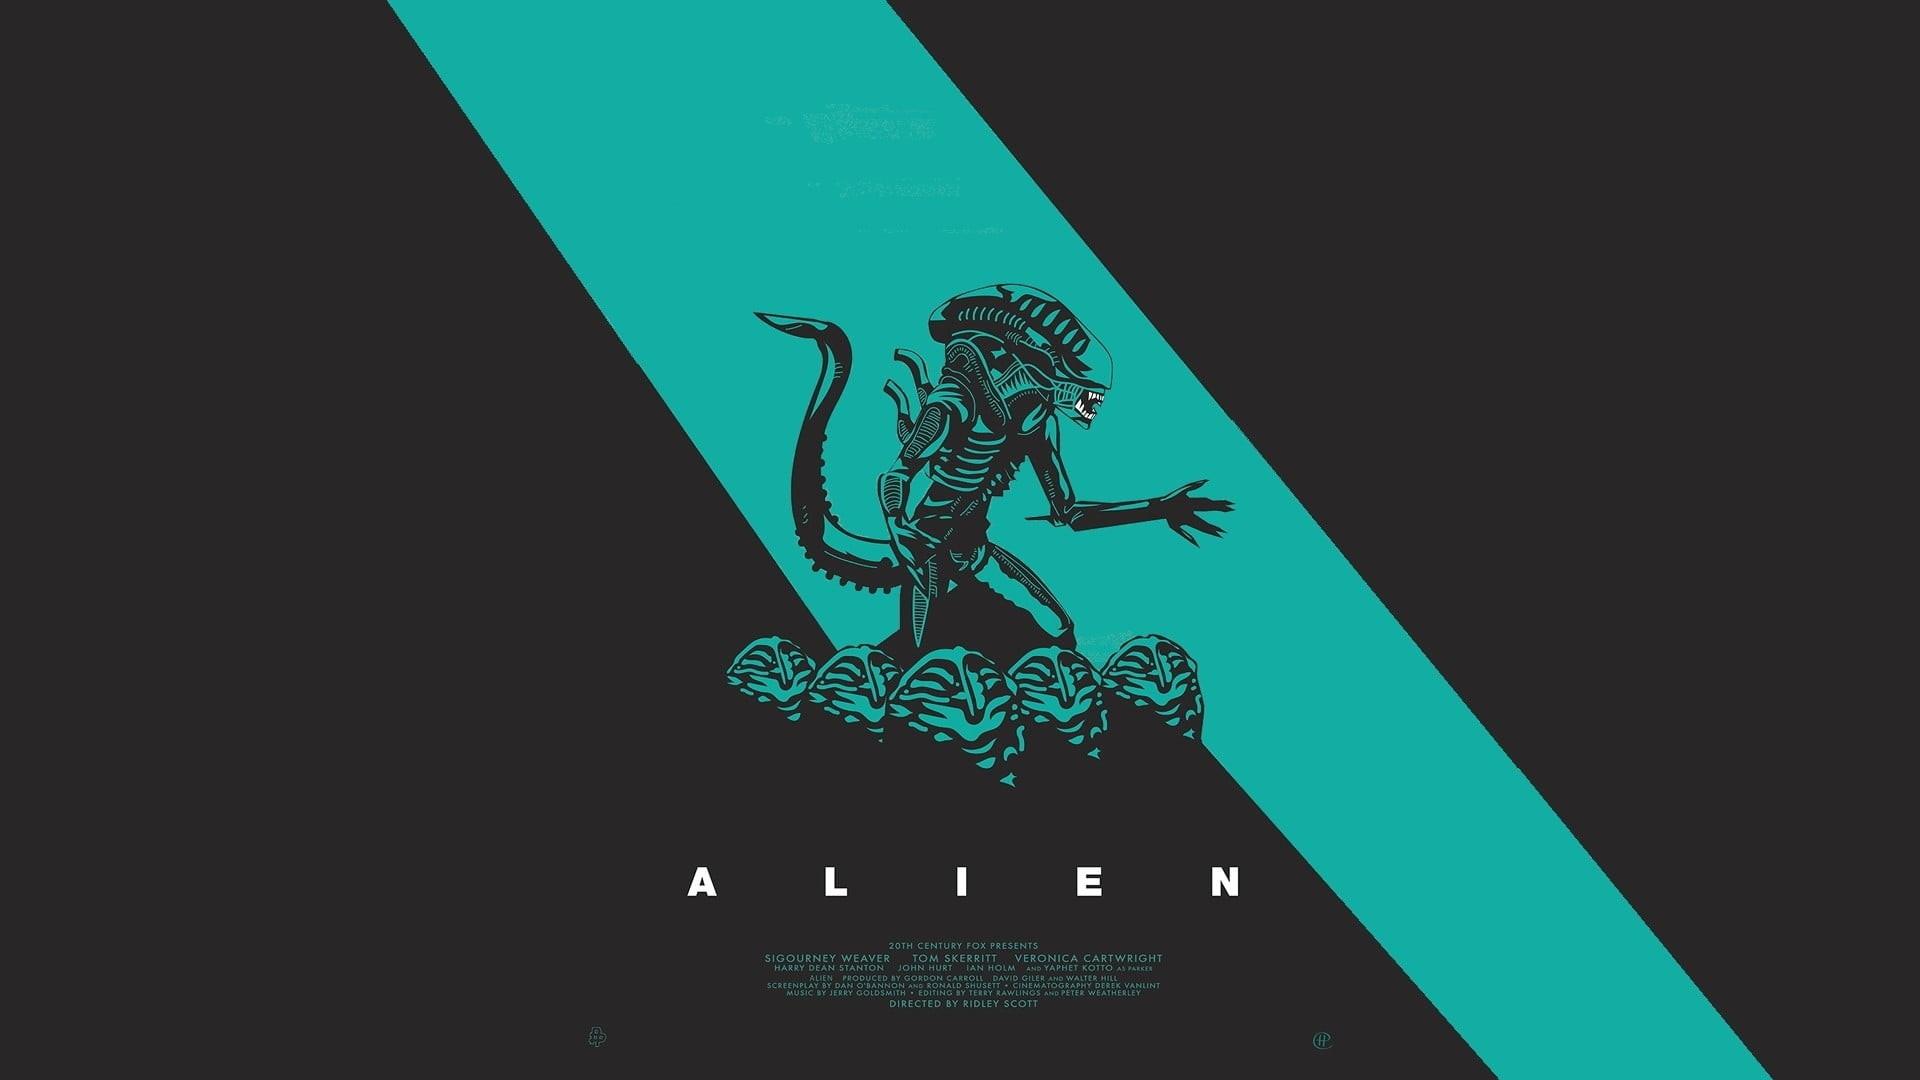 Res: 1920x1080, Alien logo photo HD wallpaper